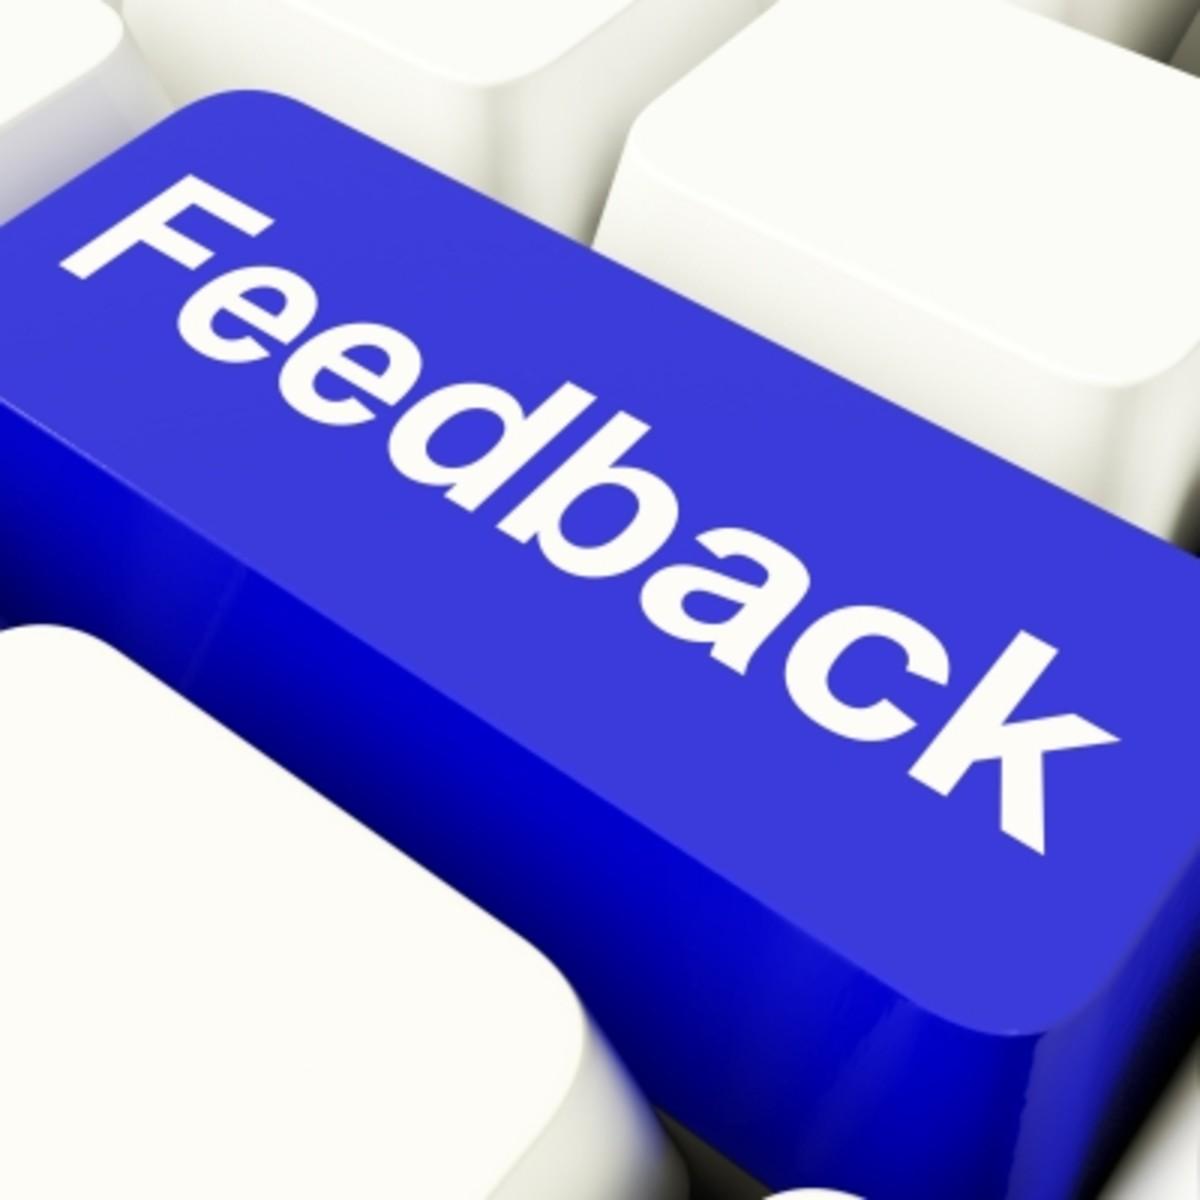 Do you give feedback?